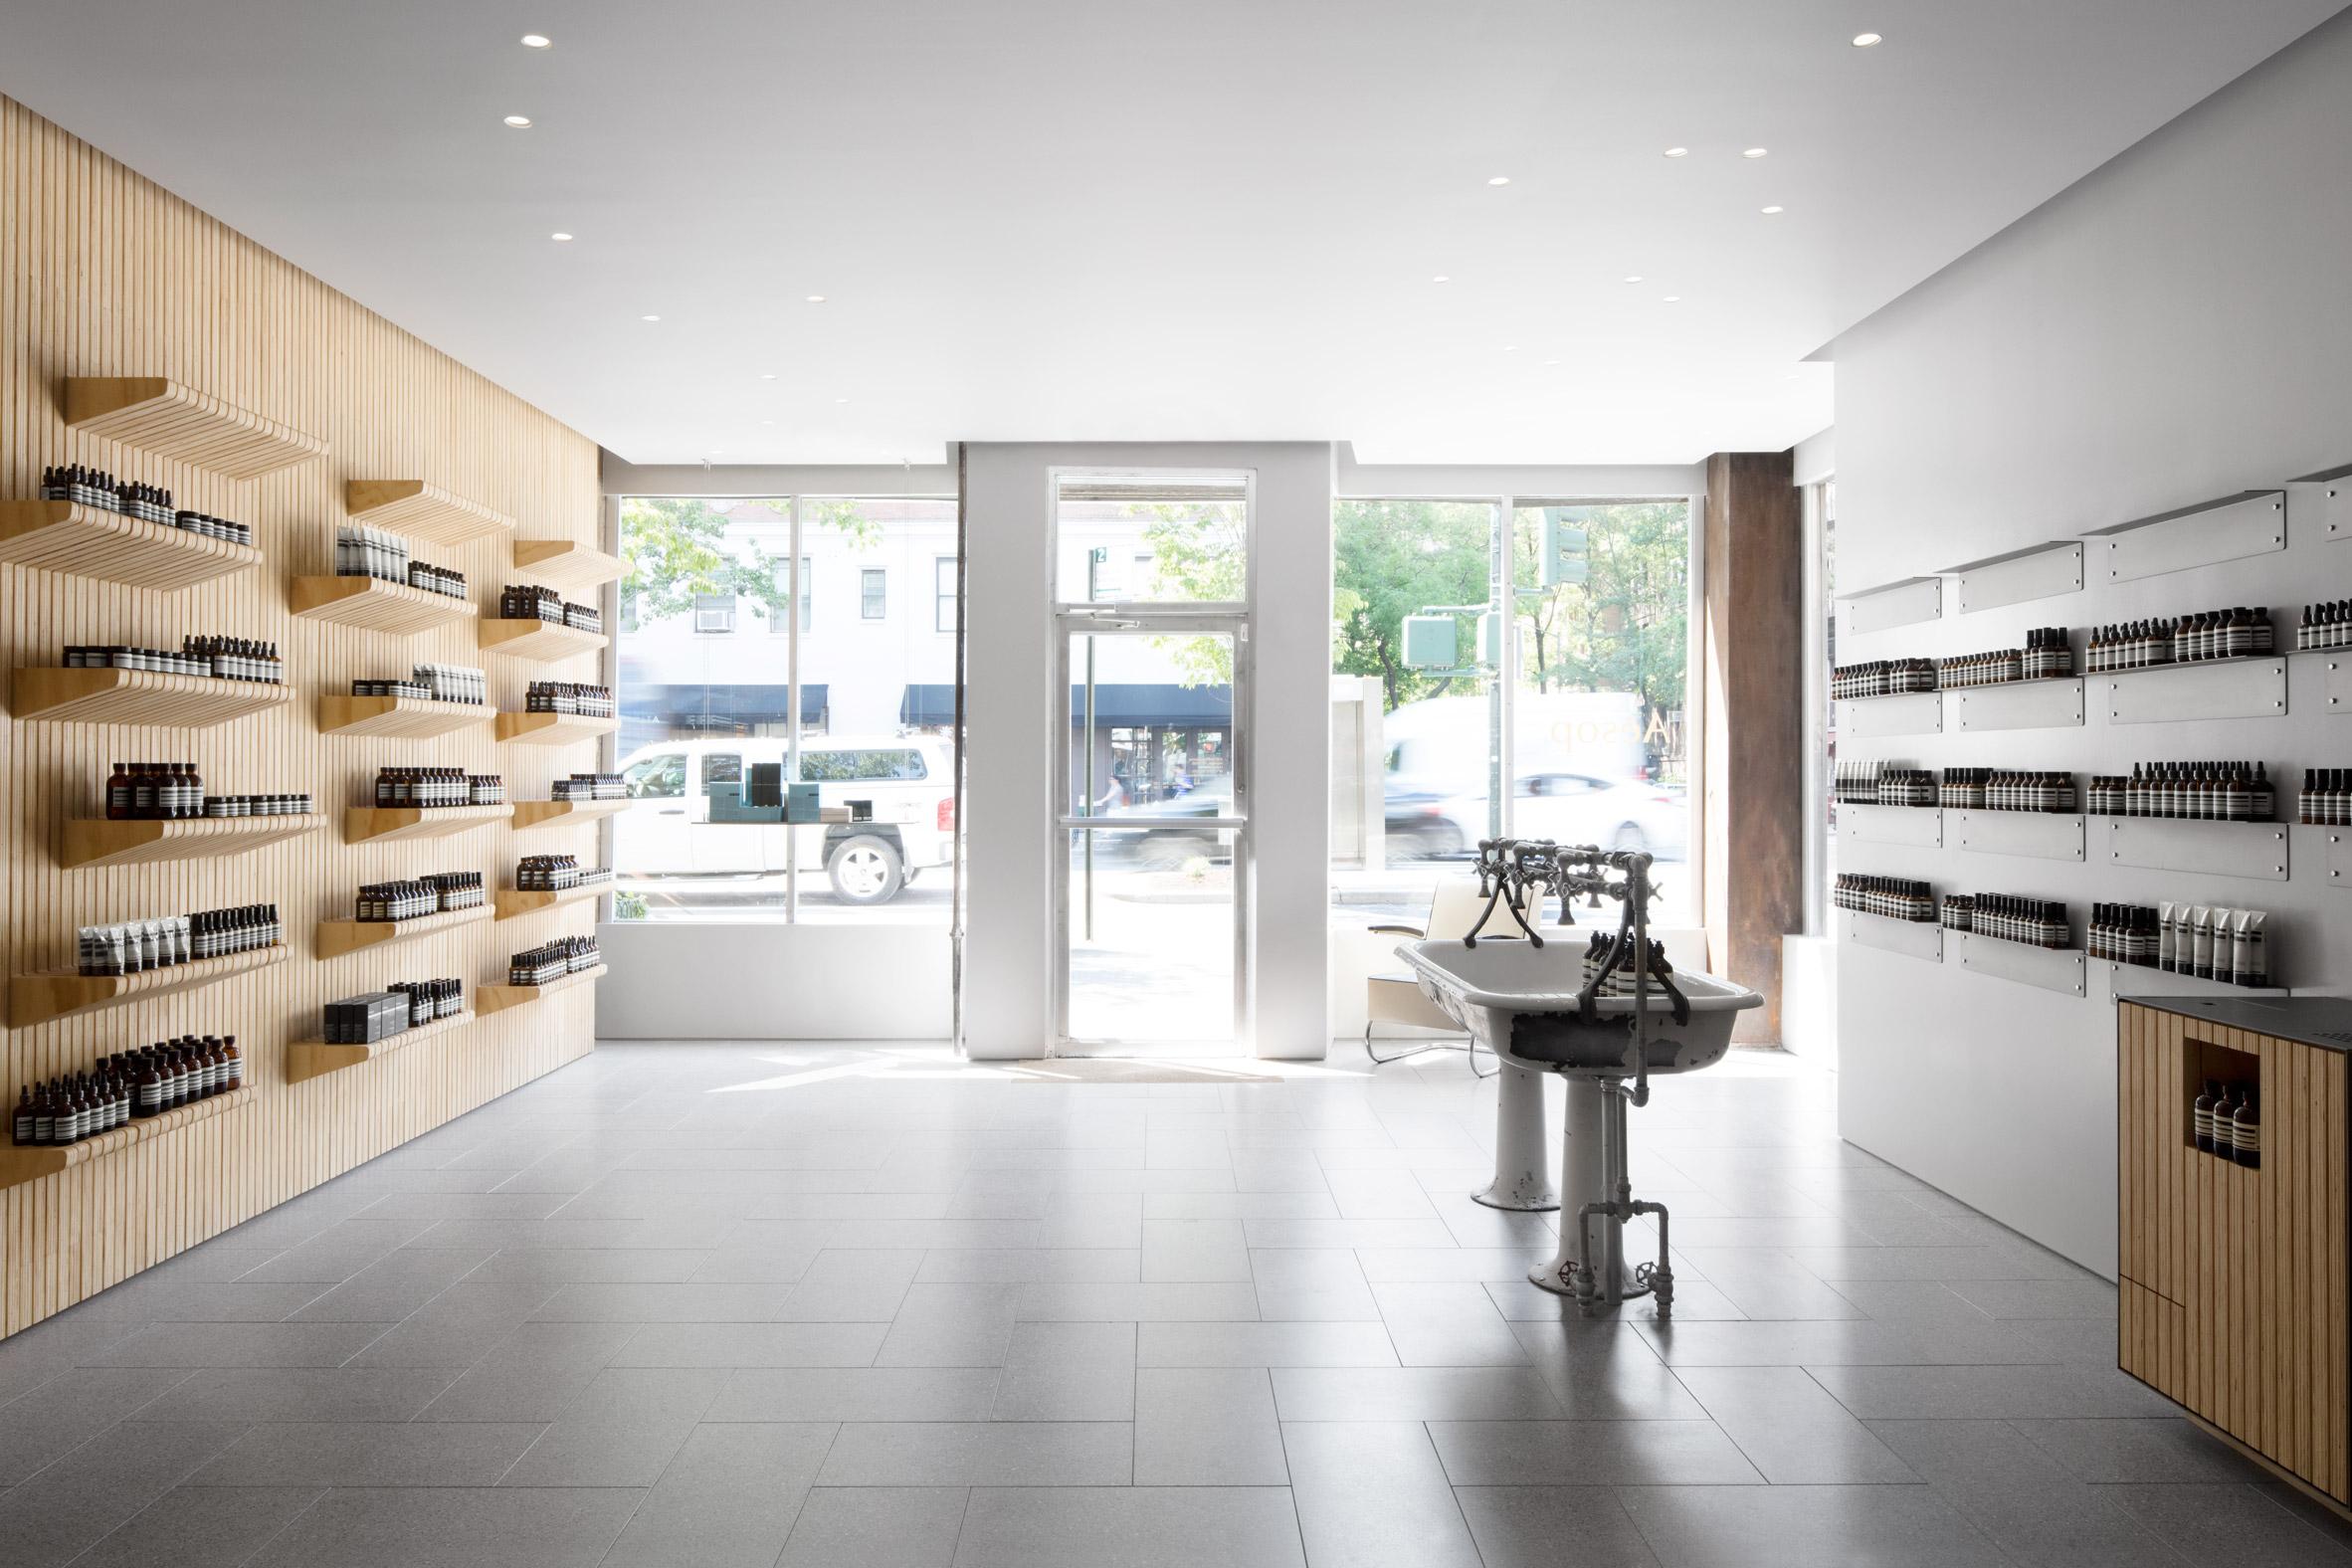 aesop-uws-tacklebox-architecture-interiors-retail_dezeen_2364_col_7.jpg